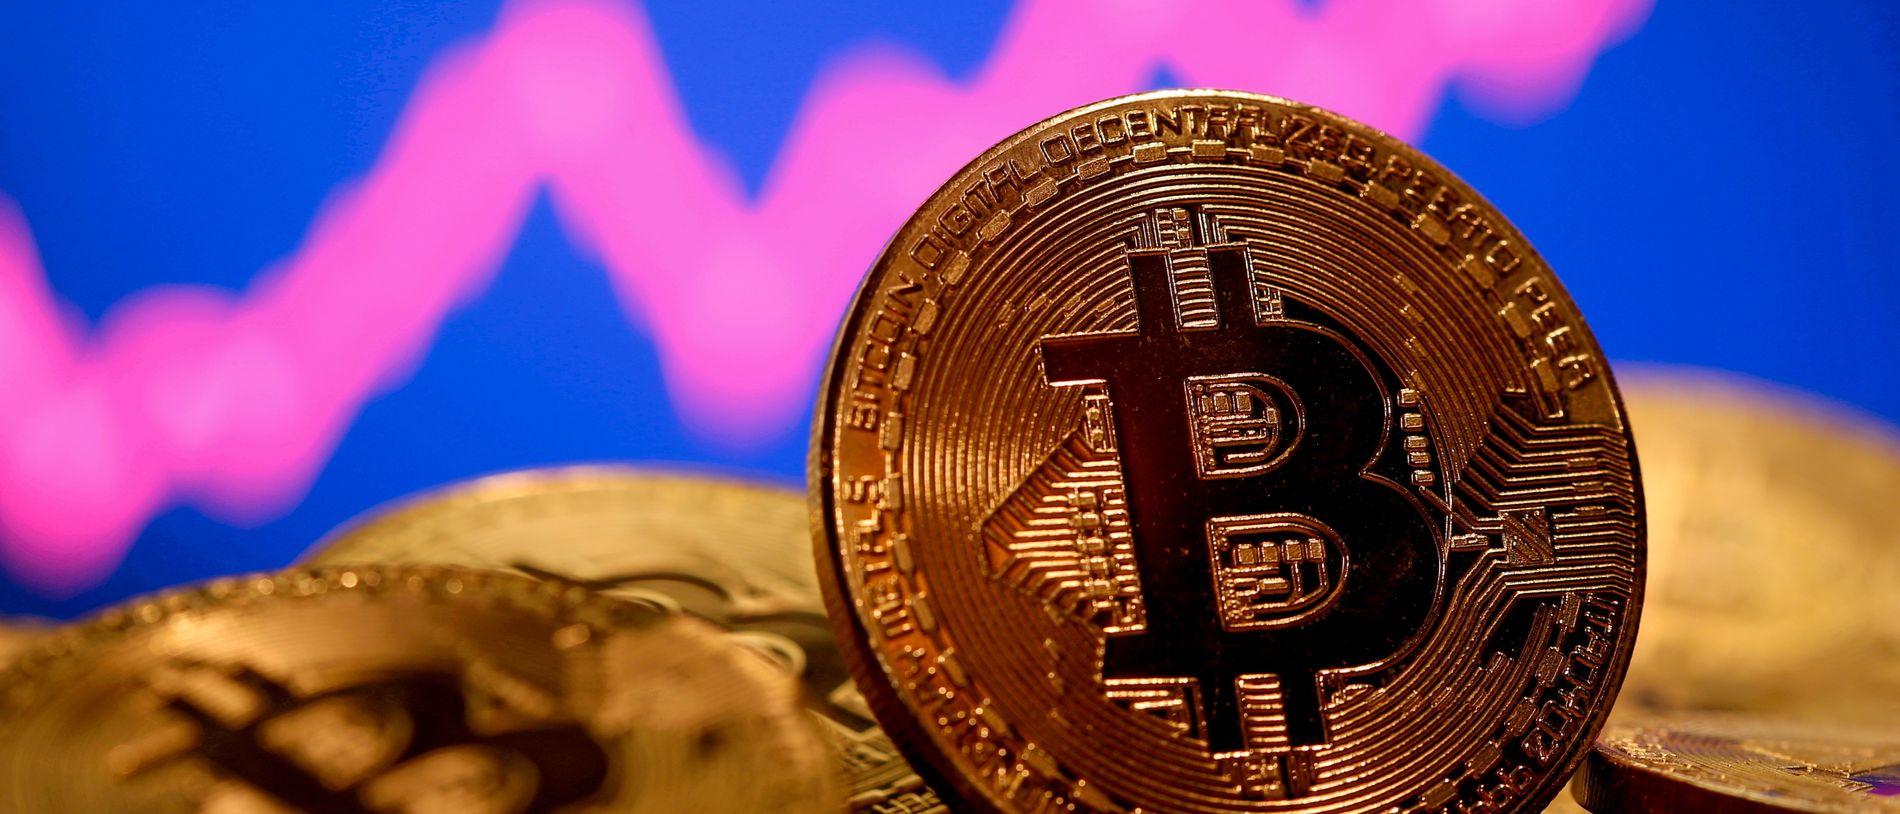 kastet bitcoin harddisk recensioni di piattaforme commerciali bitcoin